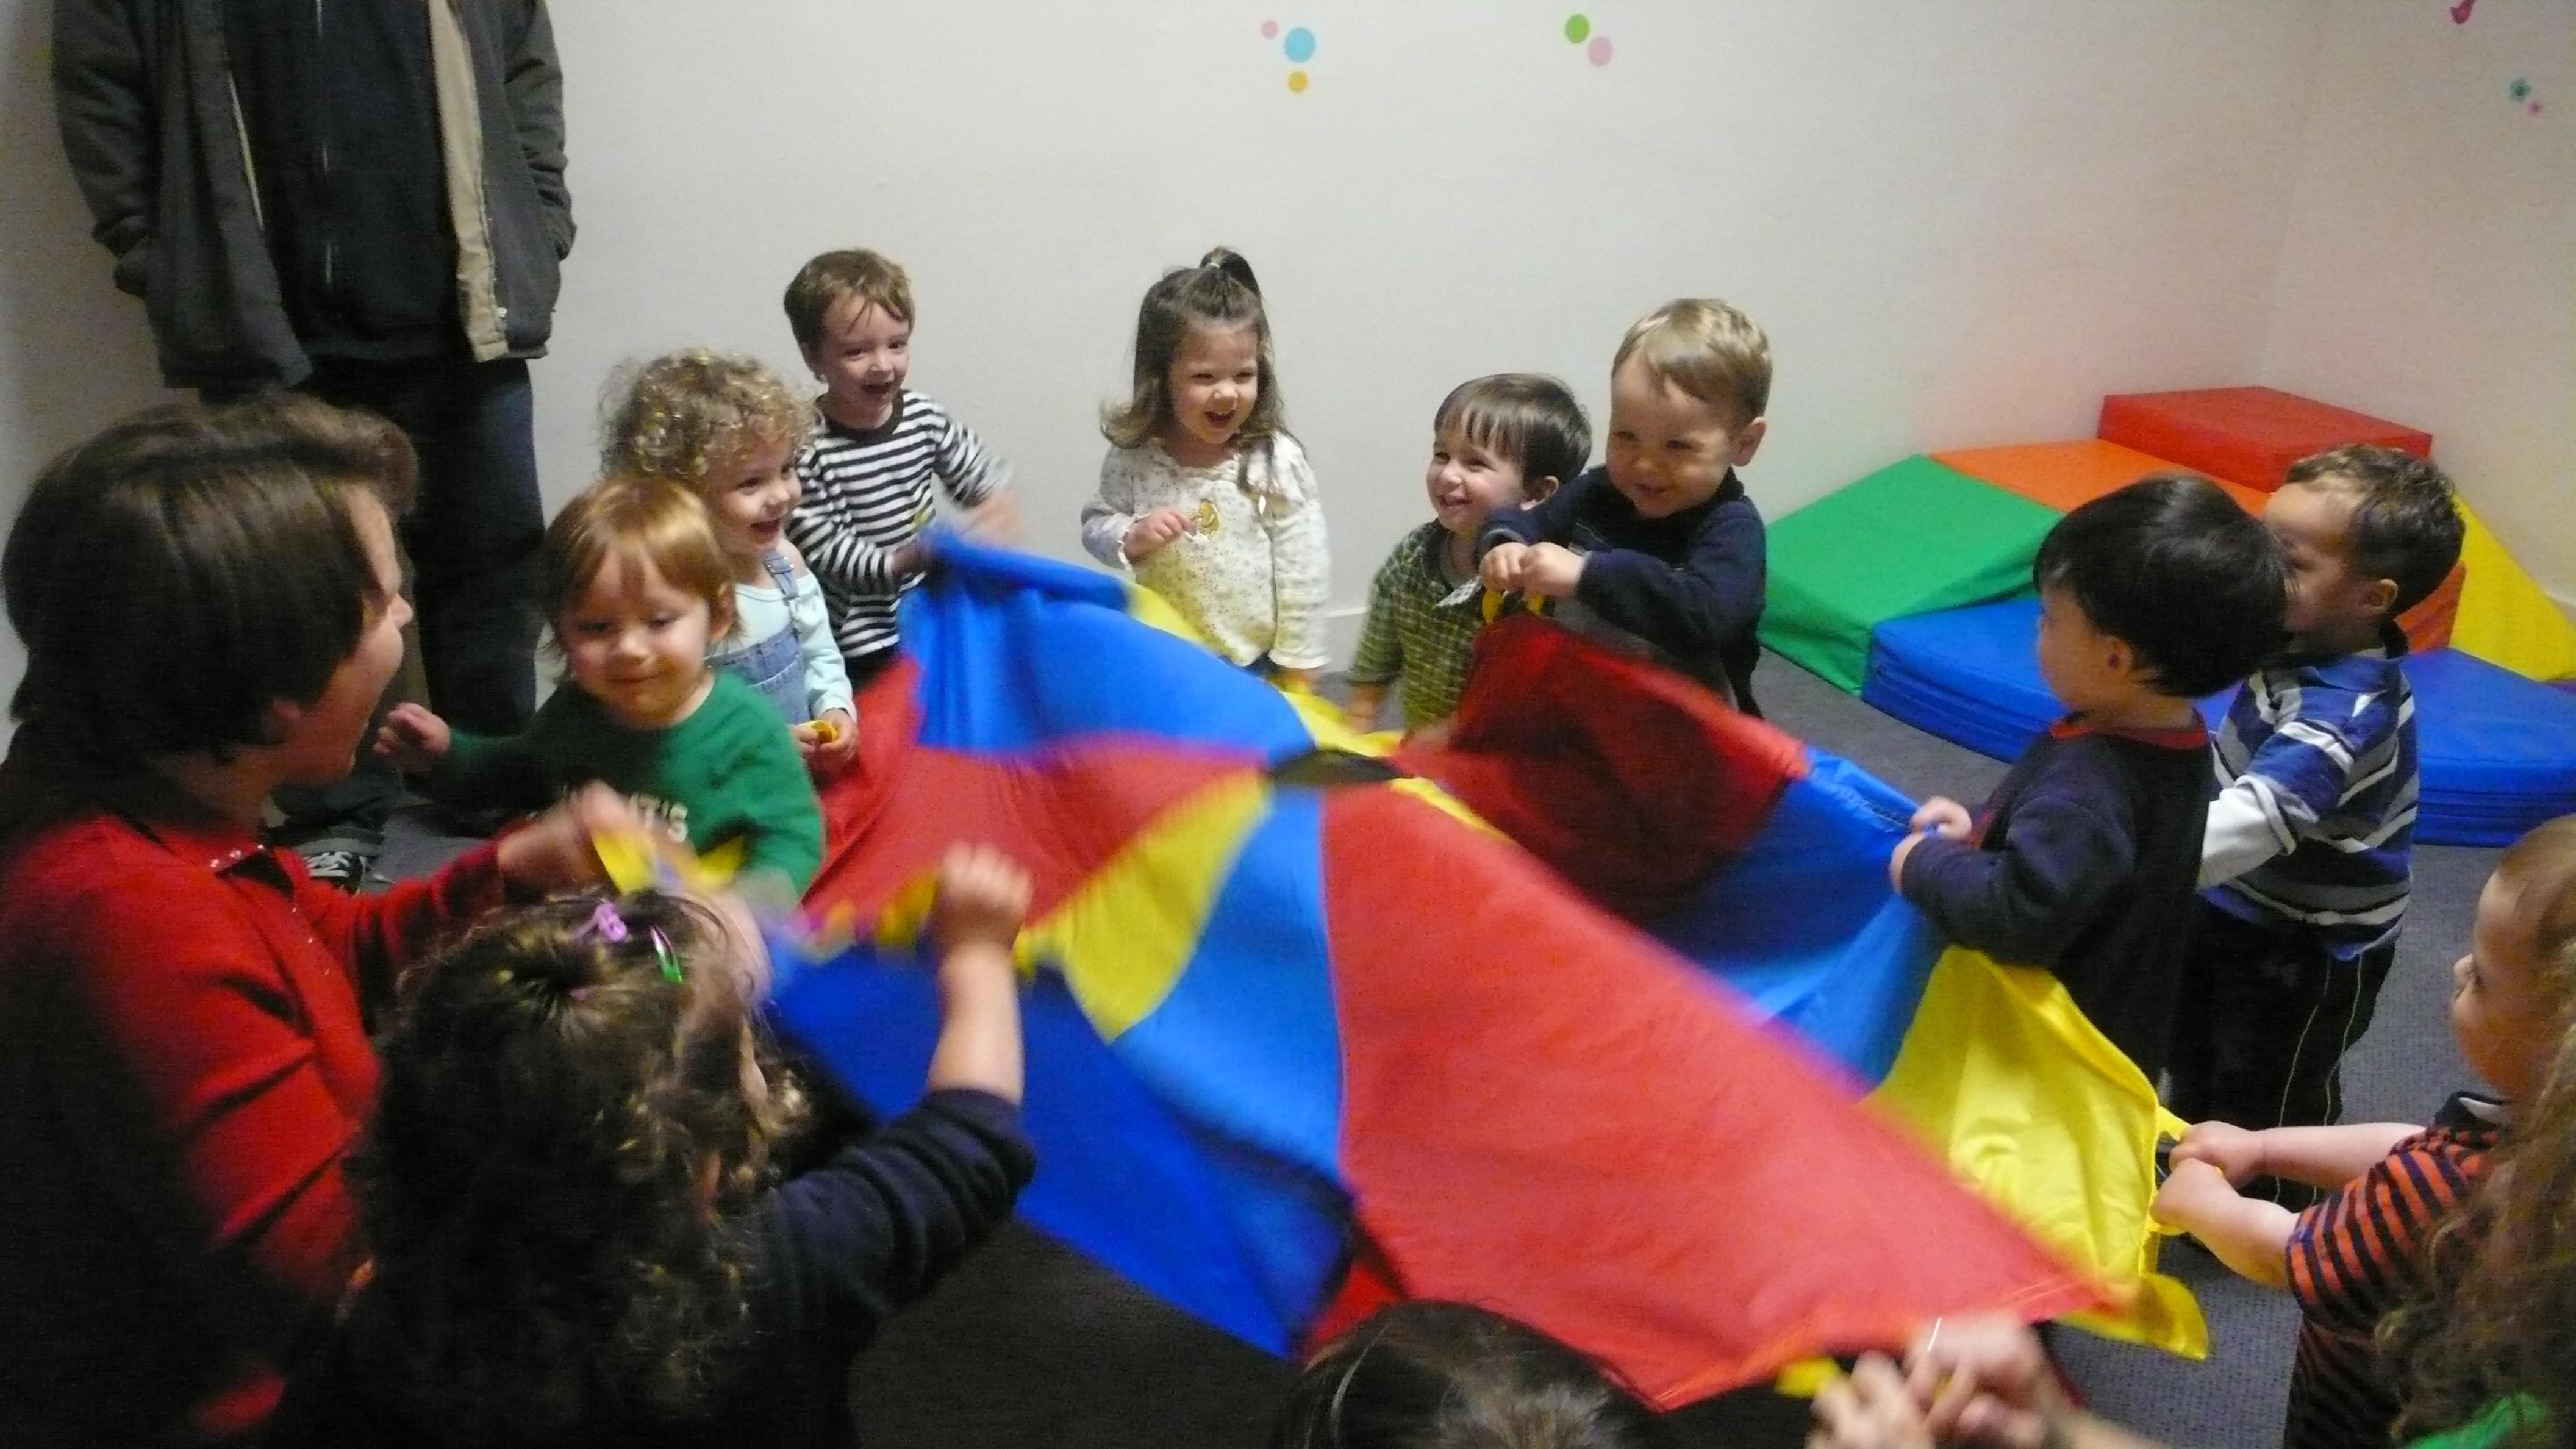 Kids at daycare